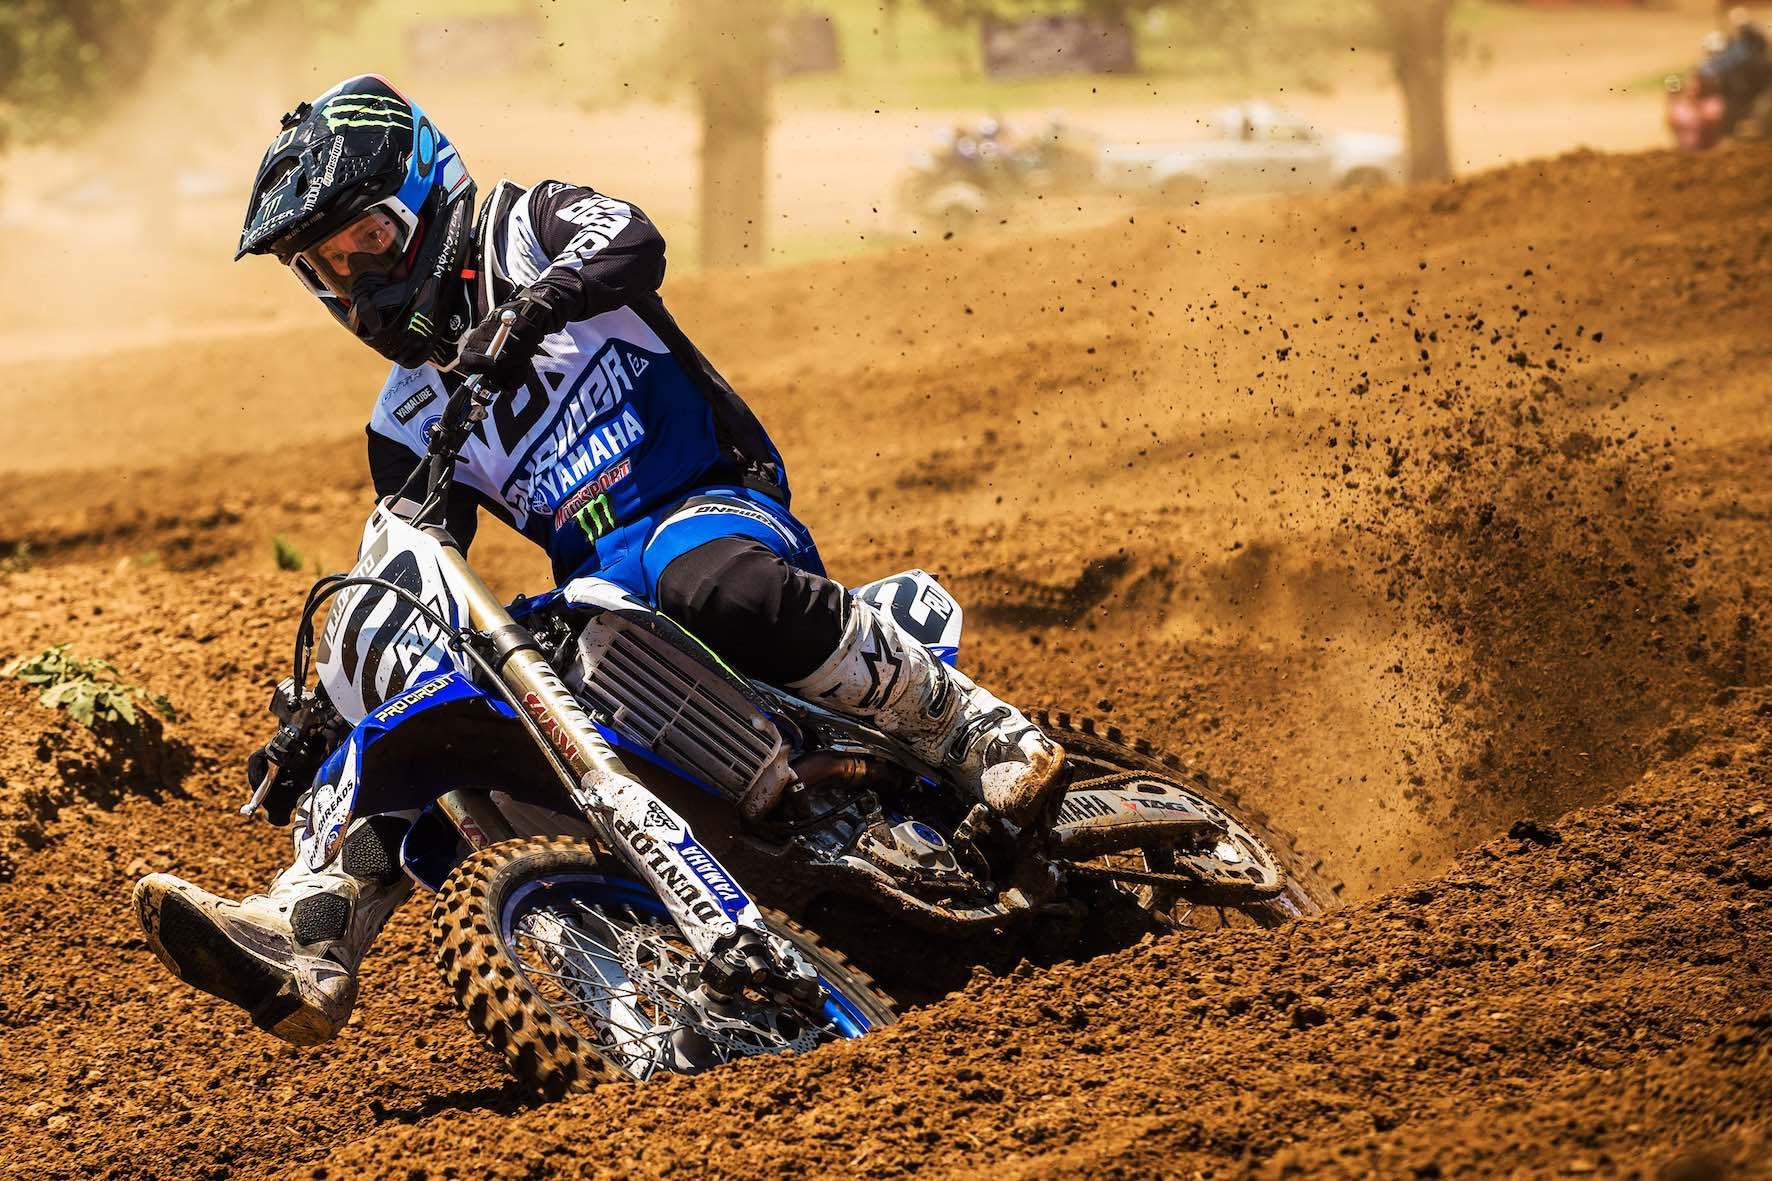 We interview Supercross pro, Ryan Villopoto